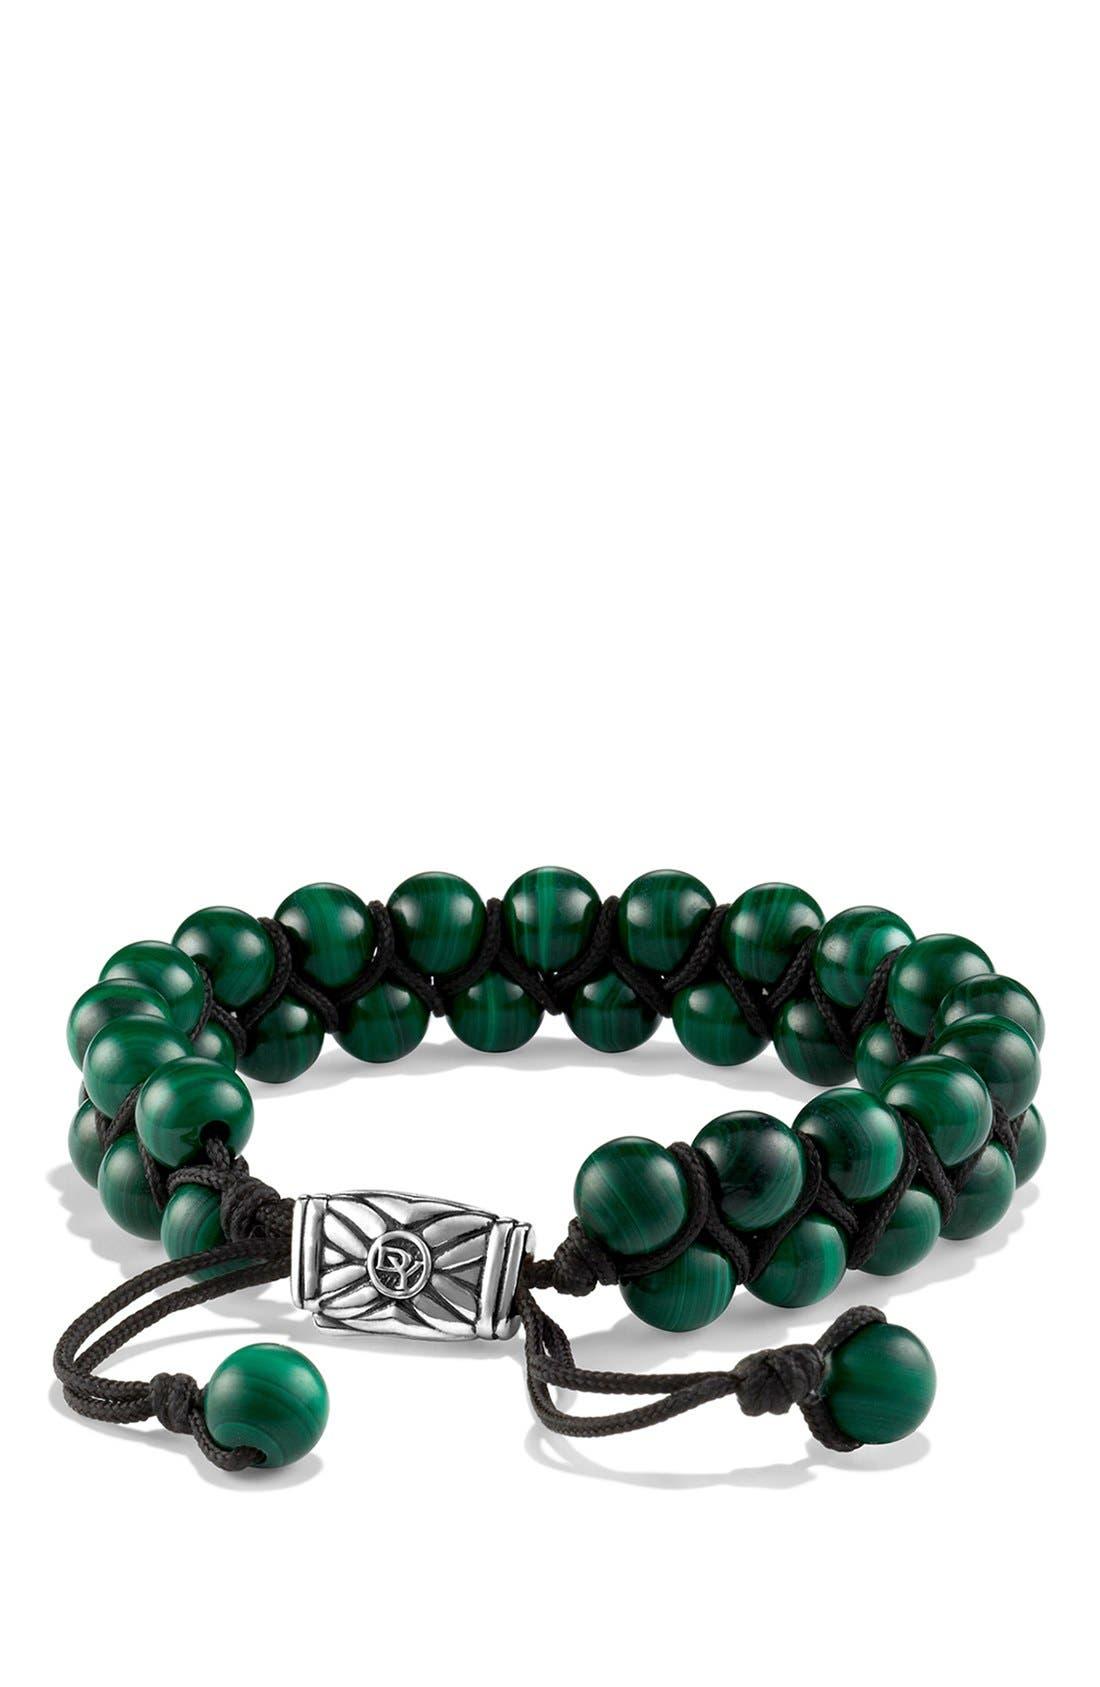 Main Image - David Yurman 'Spiritual Beads' Two-Row Bracelet with Malachite